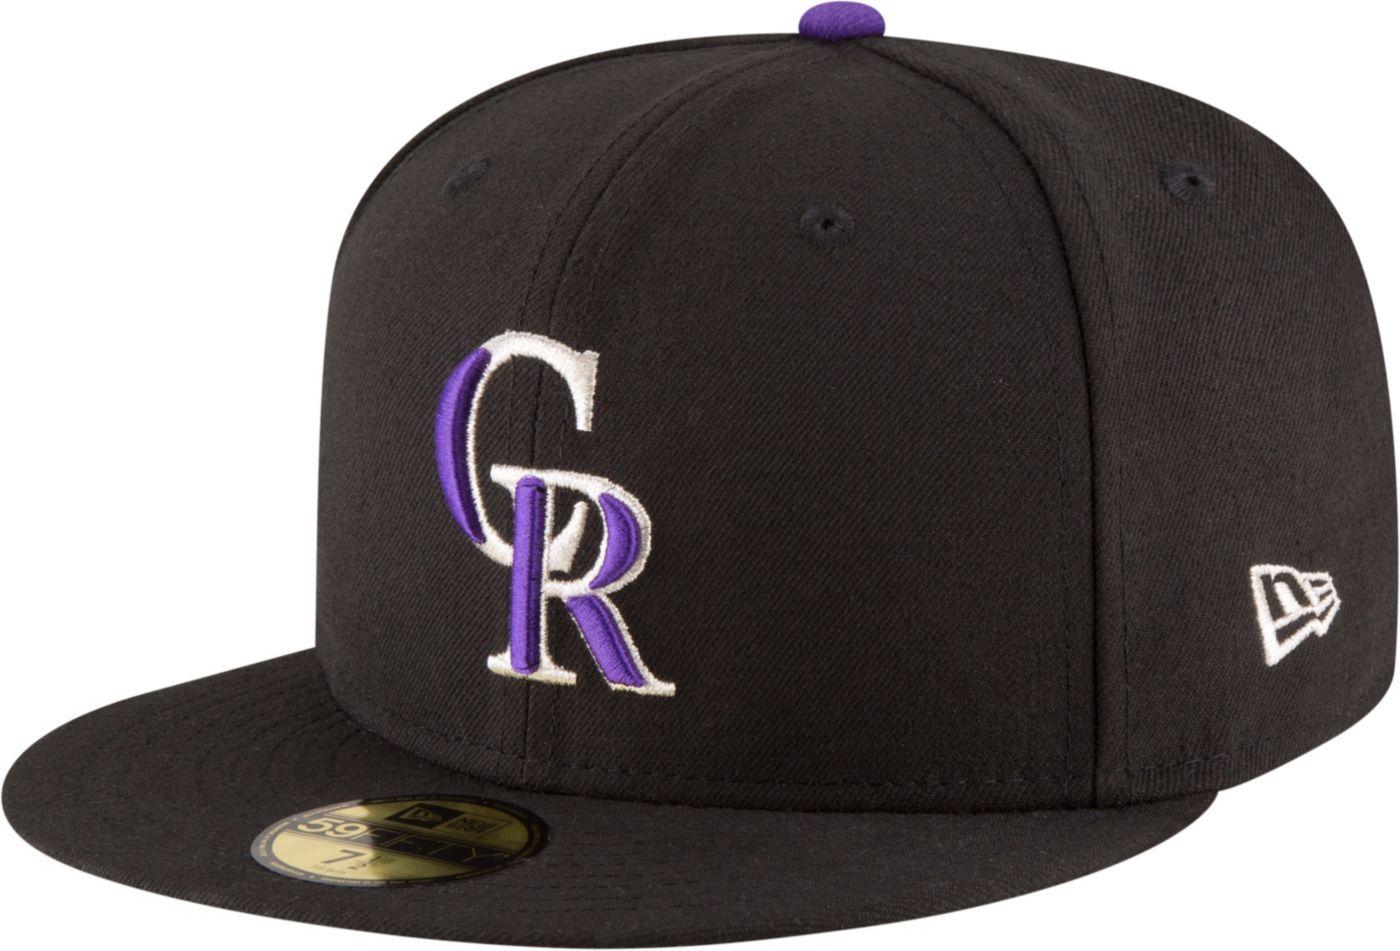 New Era Men's Colorado Rockies 59Fifty Game Black Authentic Hat